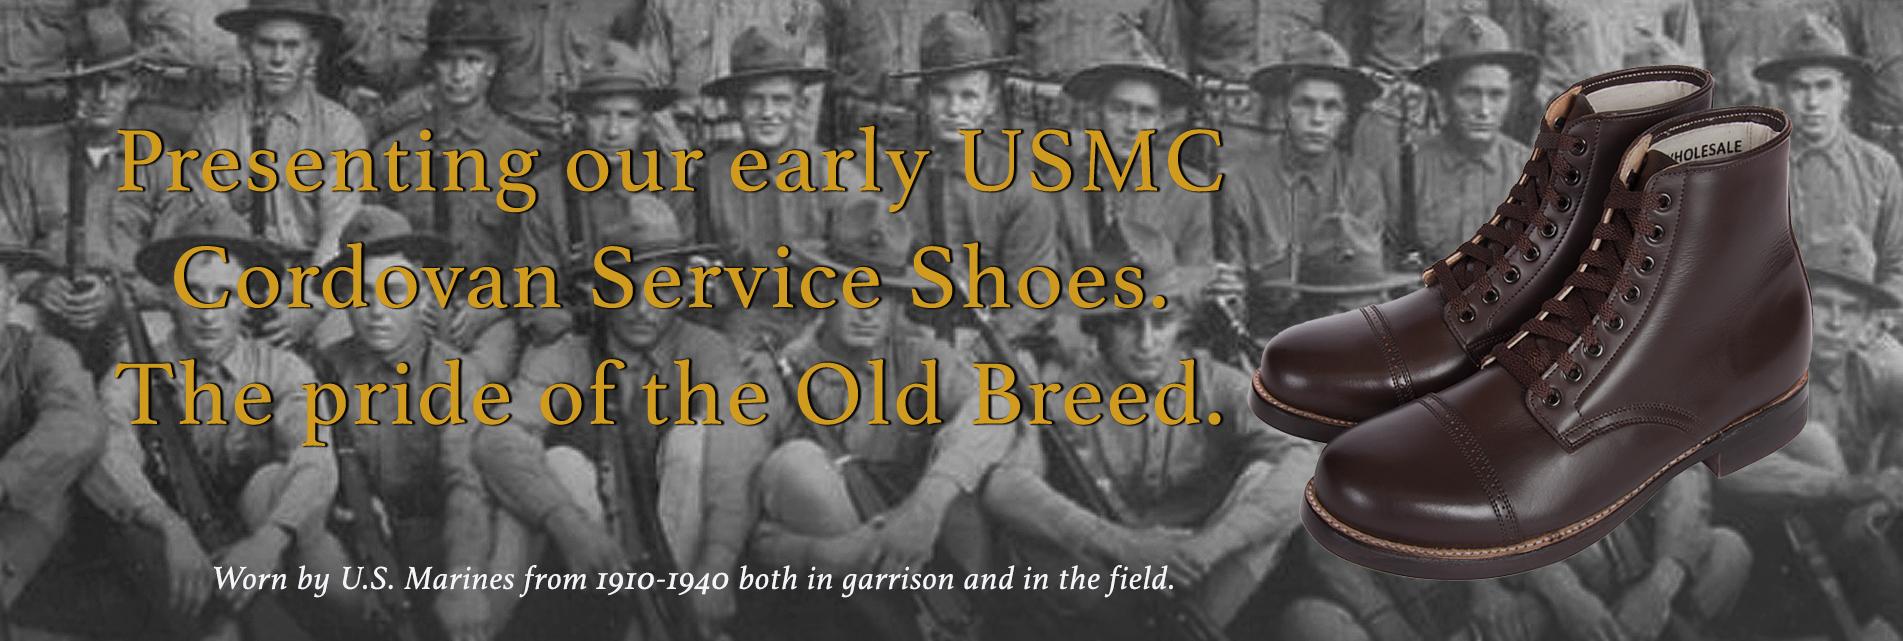 U.S. Marine Cordovan Low Boots.